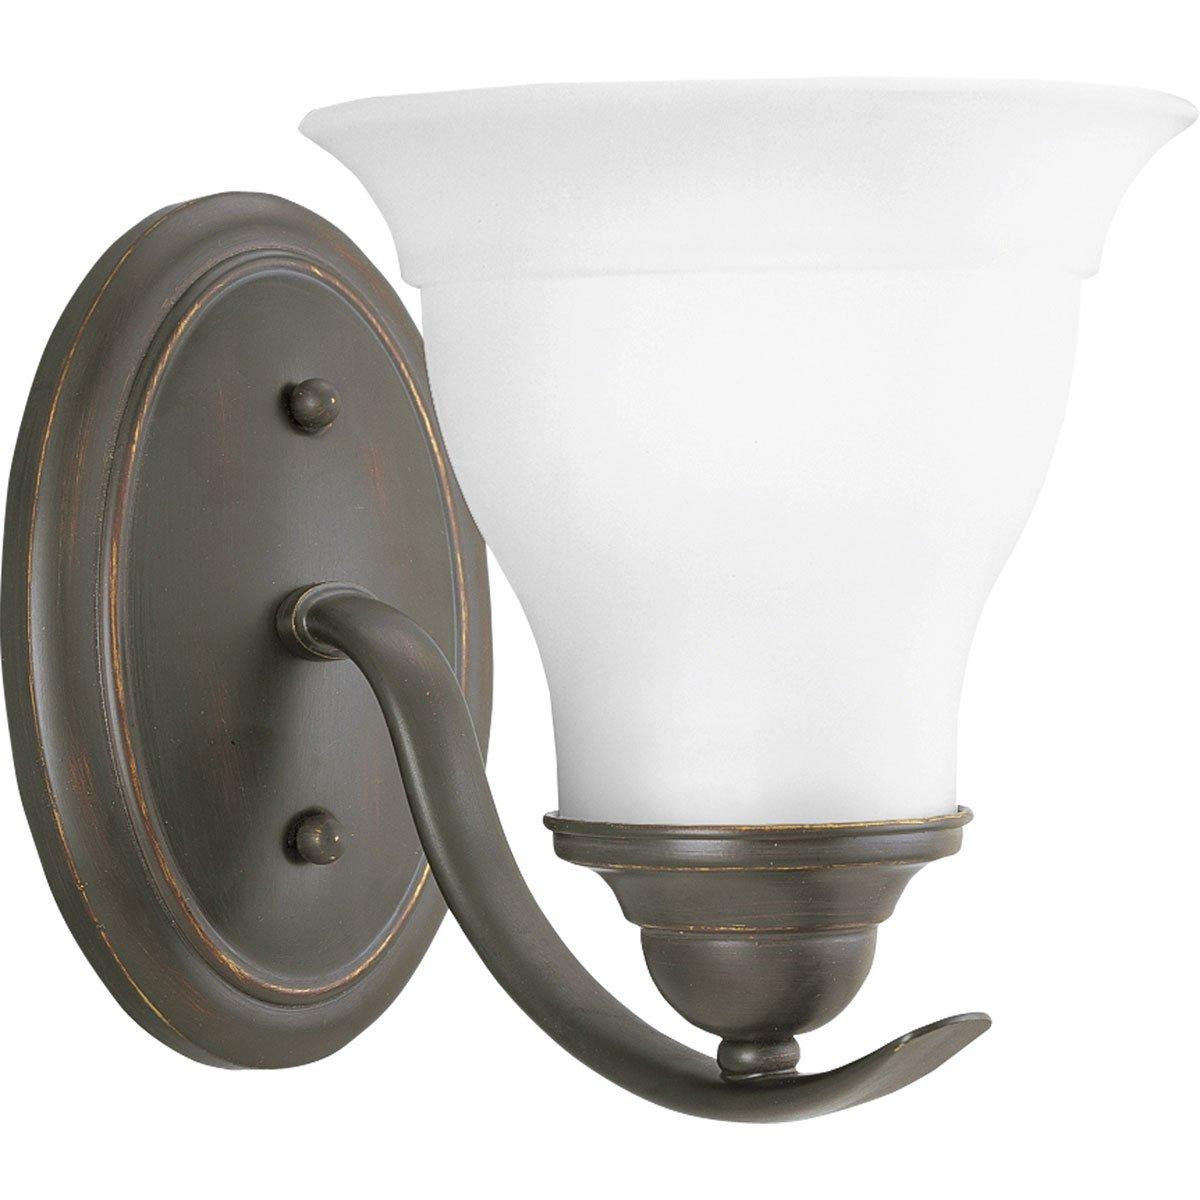 progress lighting p319009 1light bath bracket brushed nickel vanity lighting fixtures amazoncom